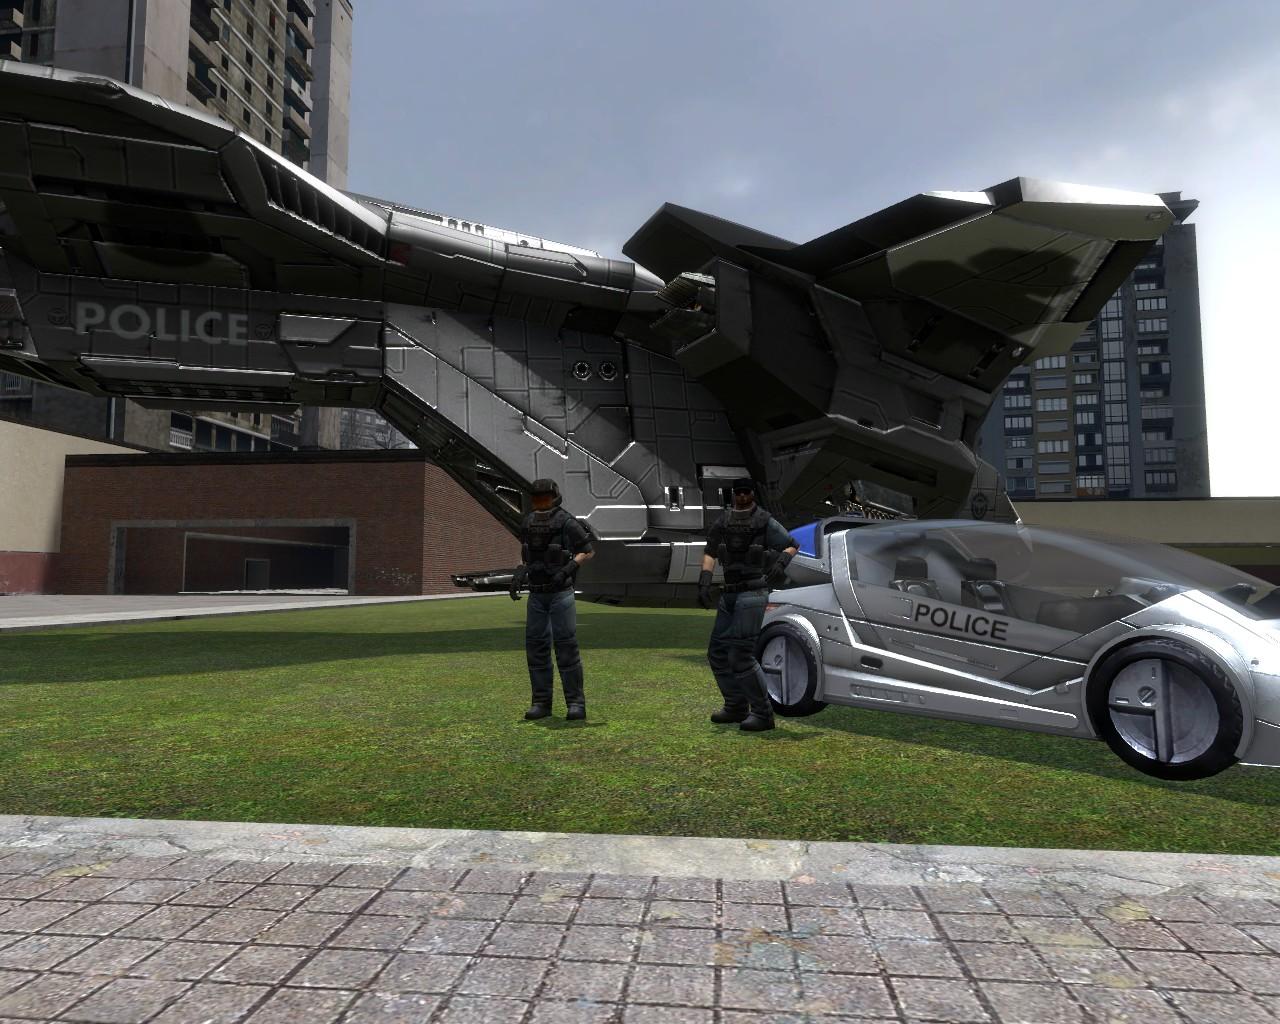 Halo 3 ODST NMPD Officers v2 addon - Garry's Mod - Mod DB